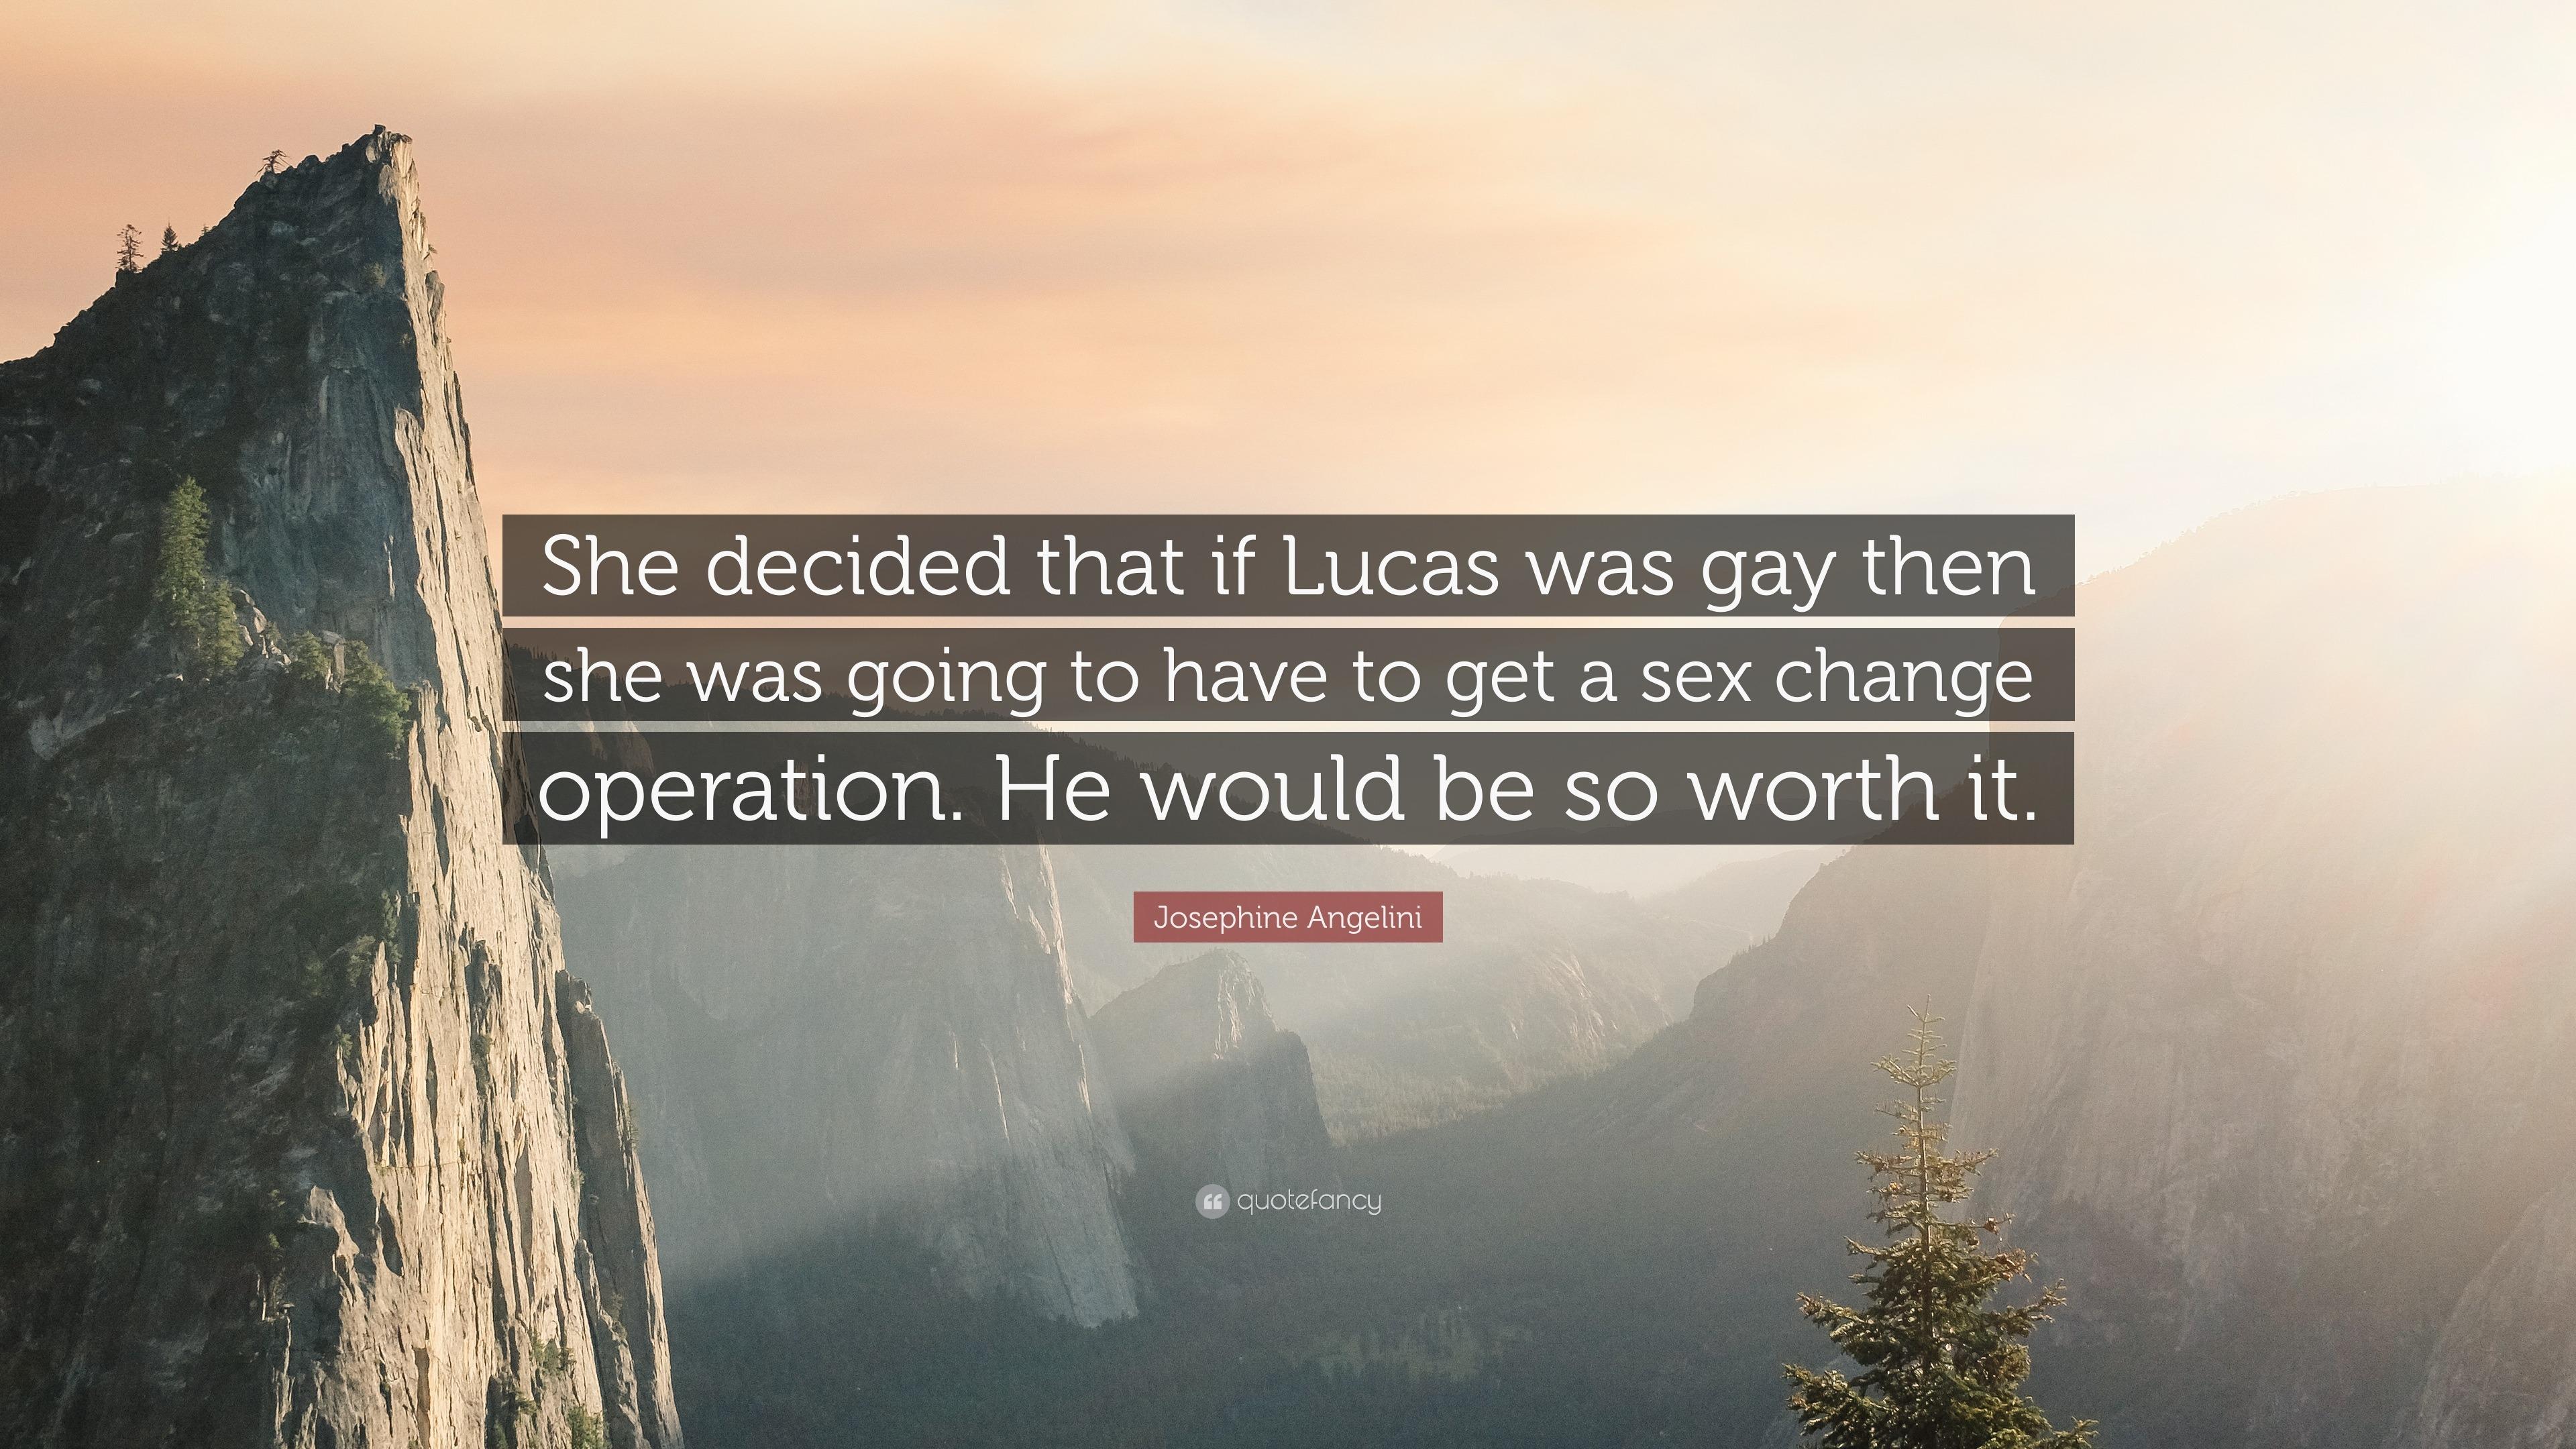 Is a sex change worth it